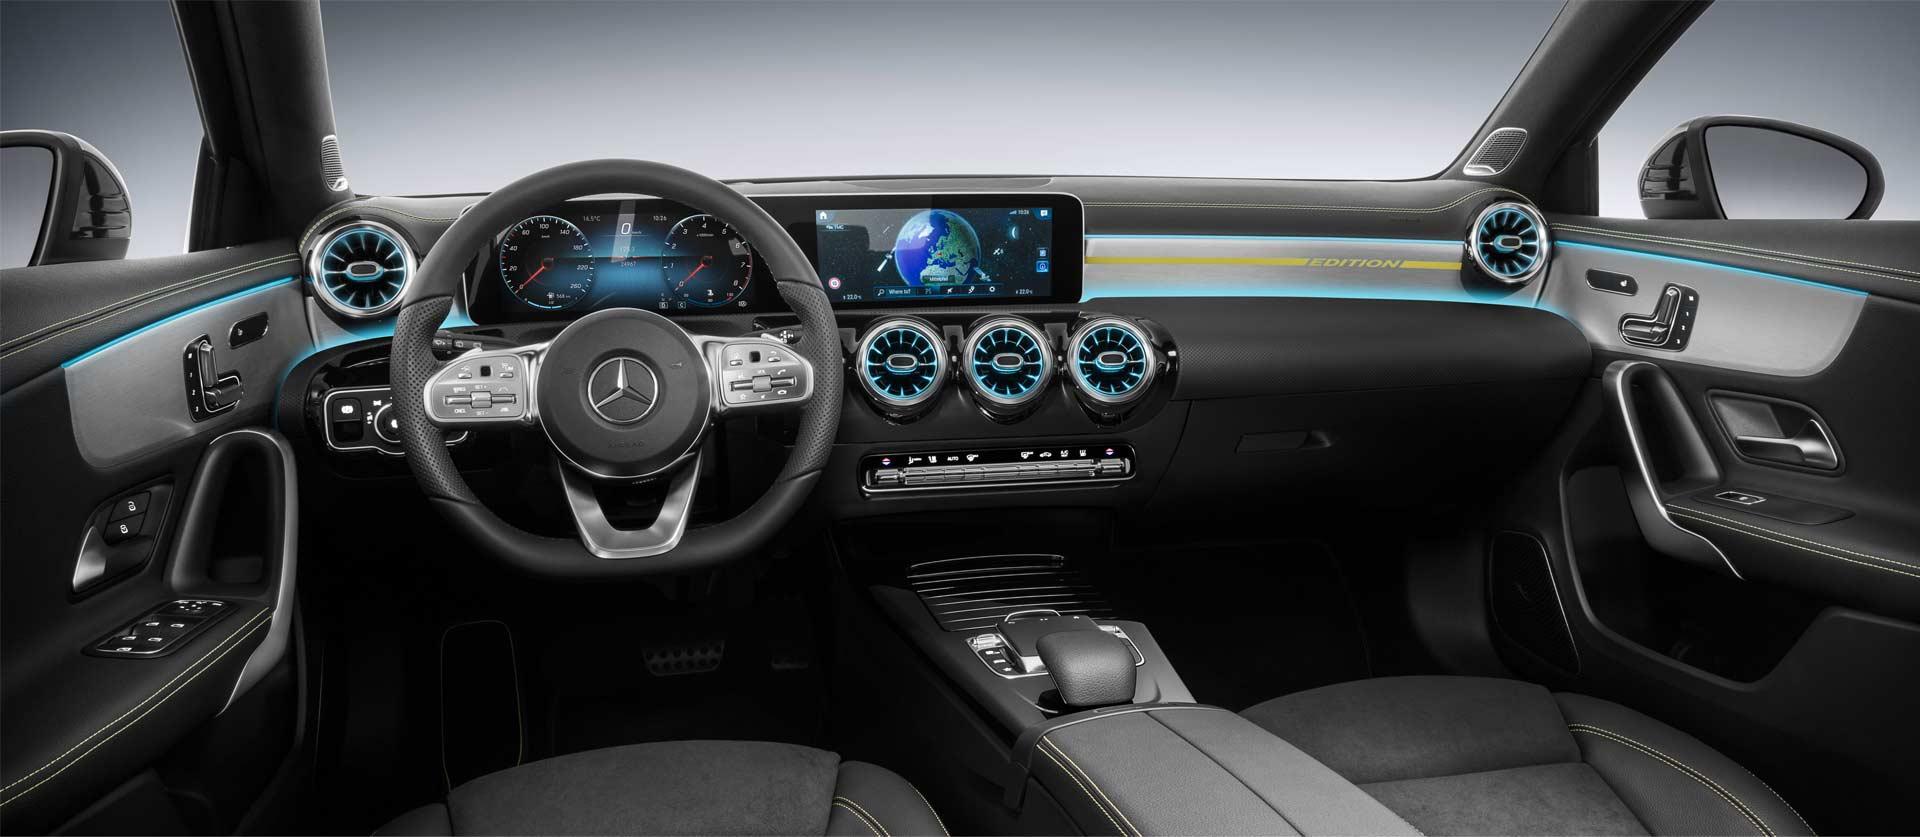 2018-Mercedes-Benz-A-Class-interior_2